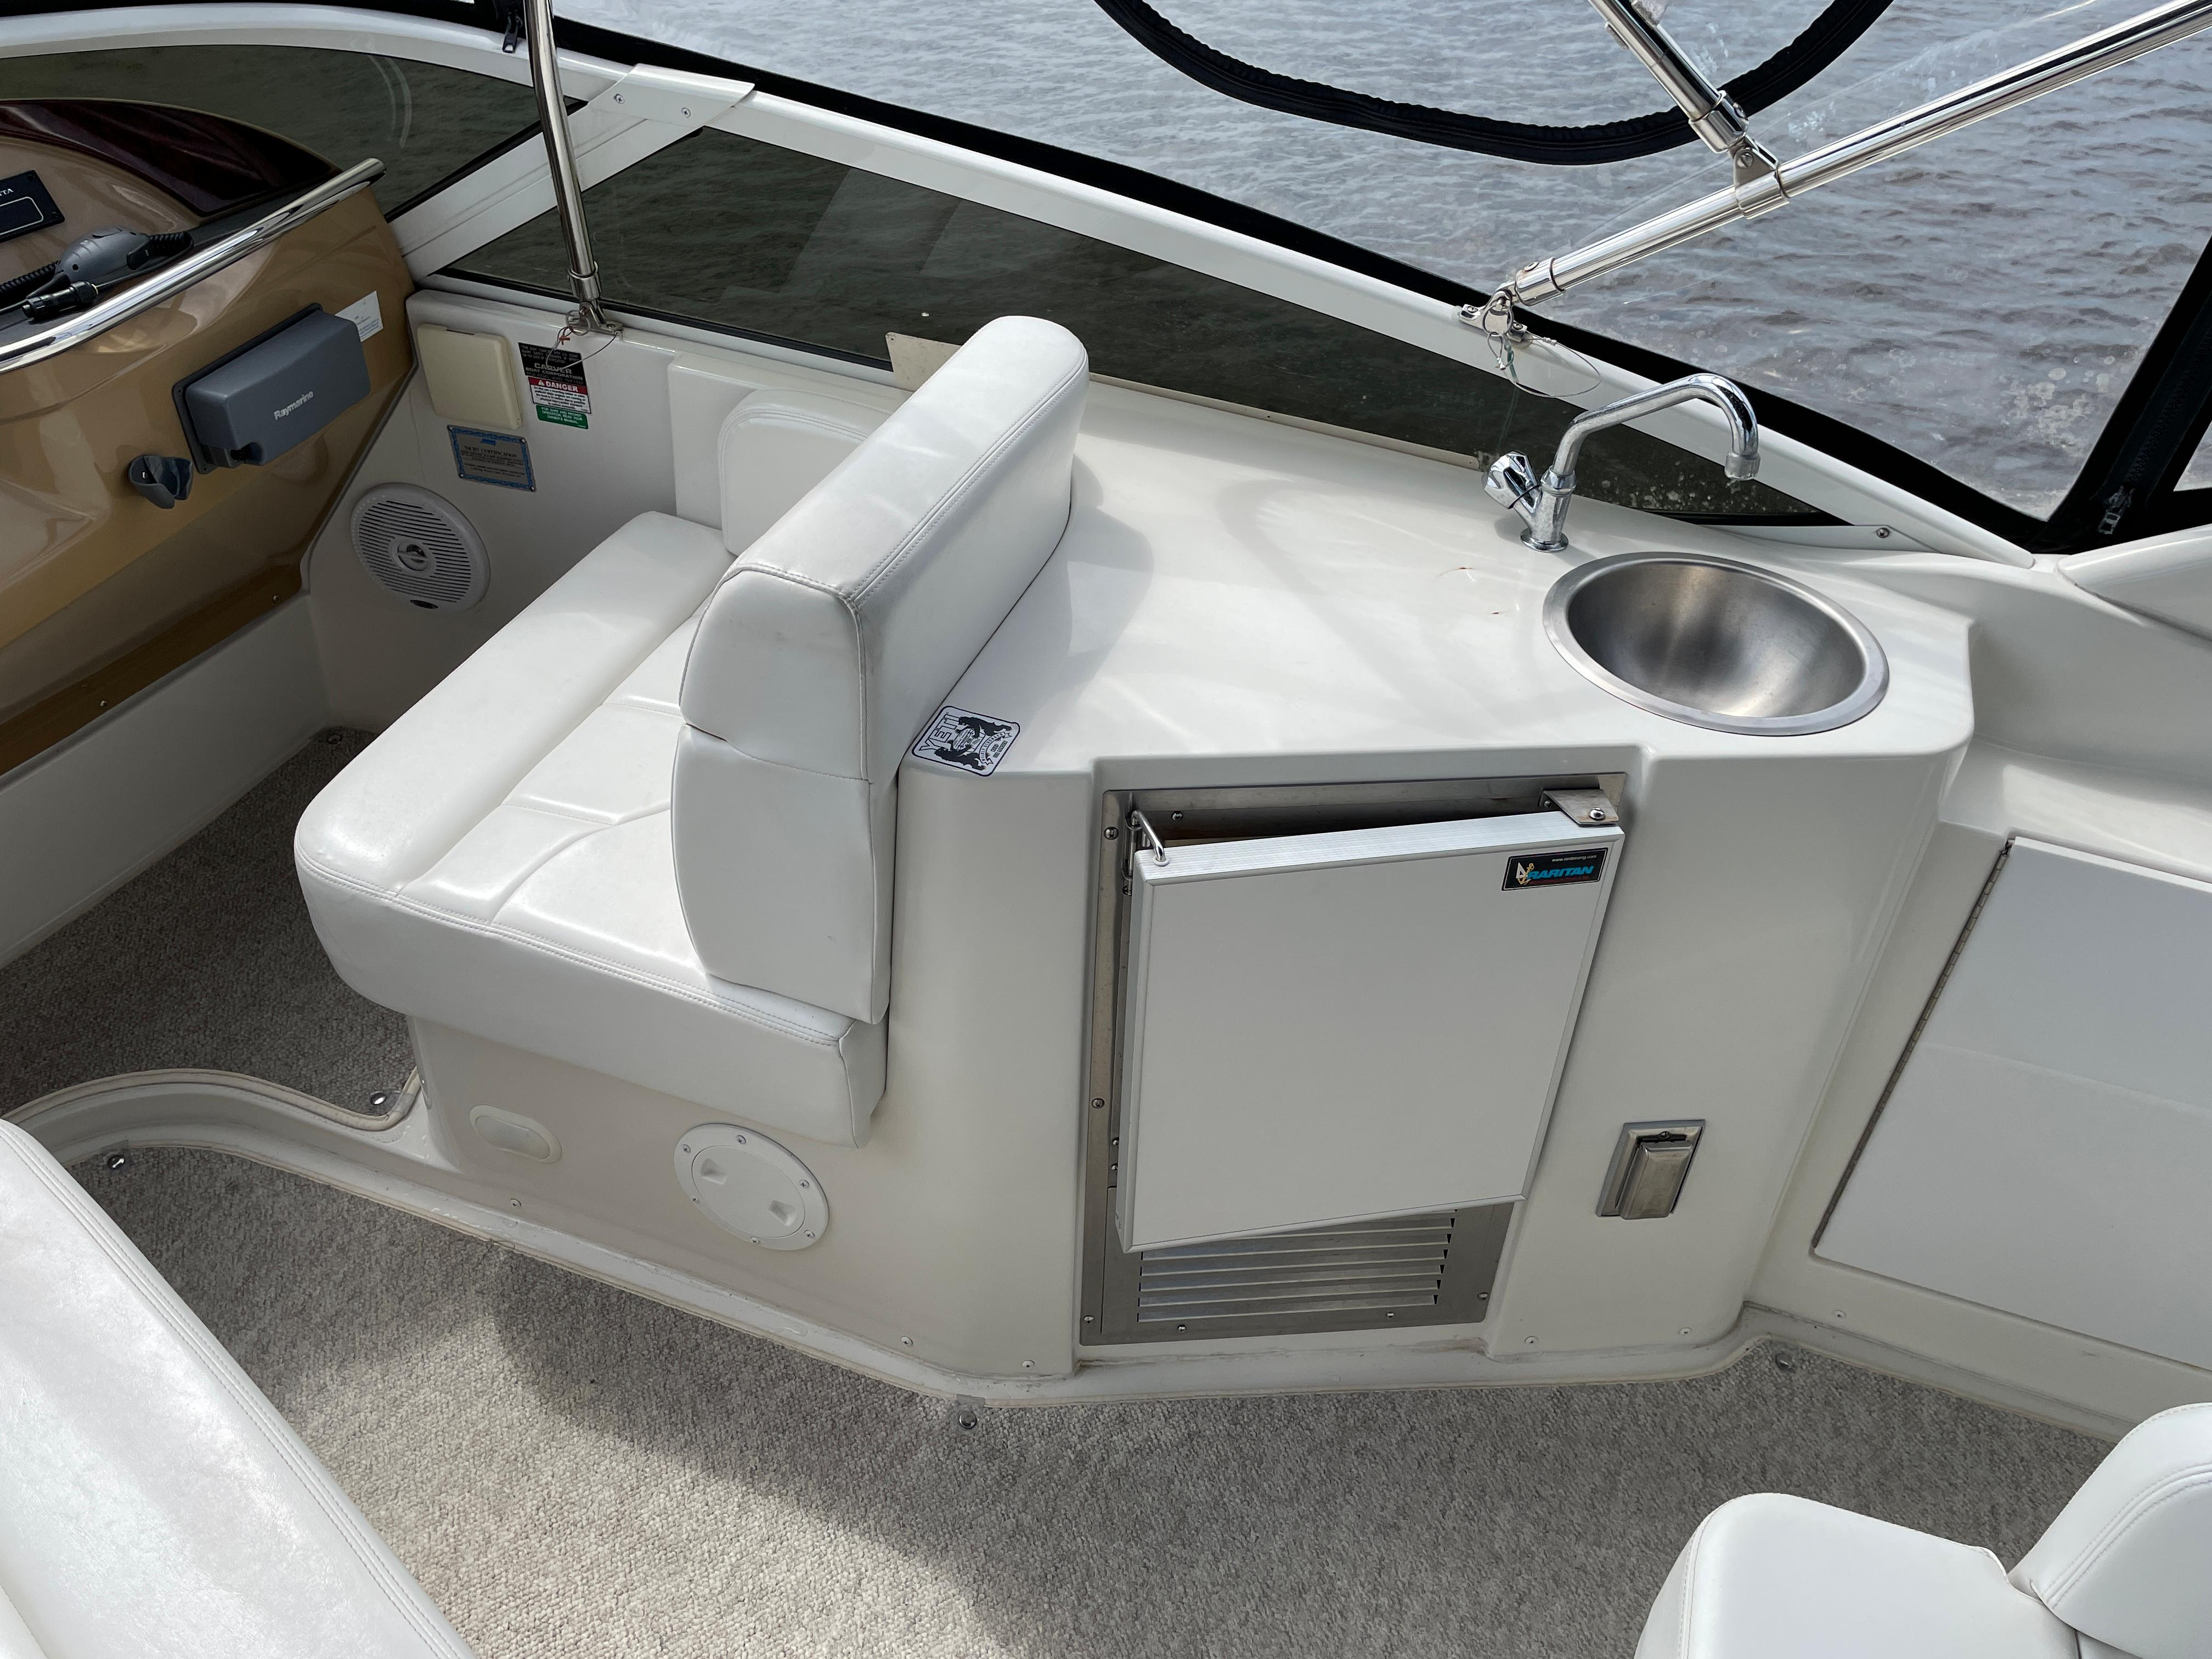 Carver 444 Cockpit Motor Yacht - Companion Seat/Wet Bar/Icemaker